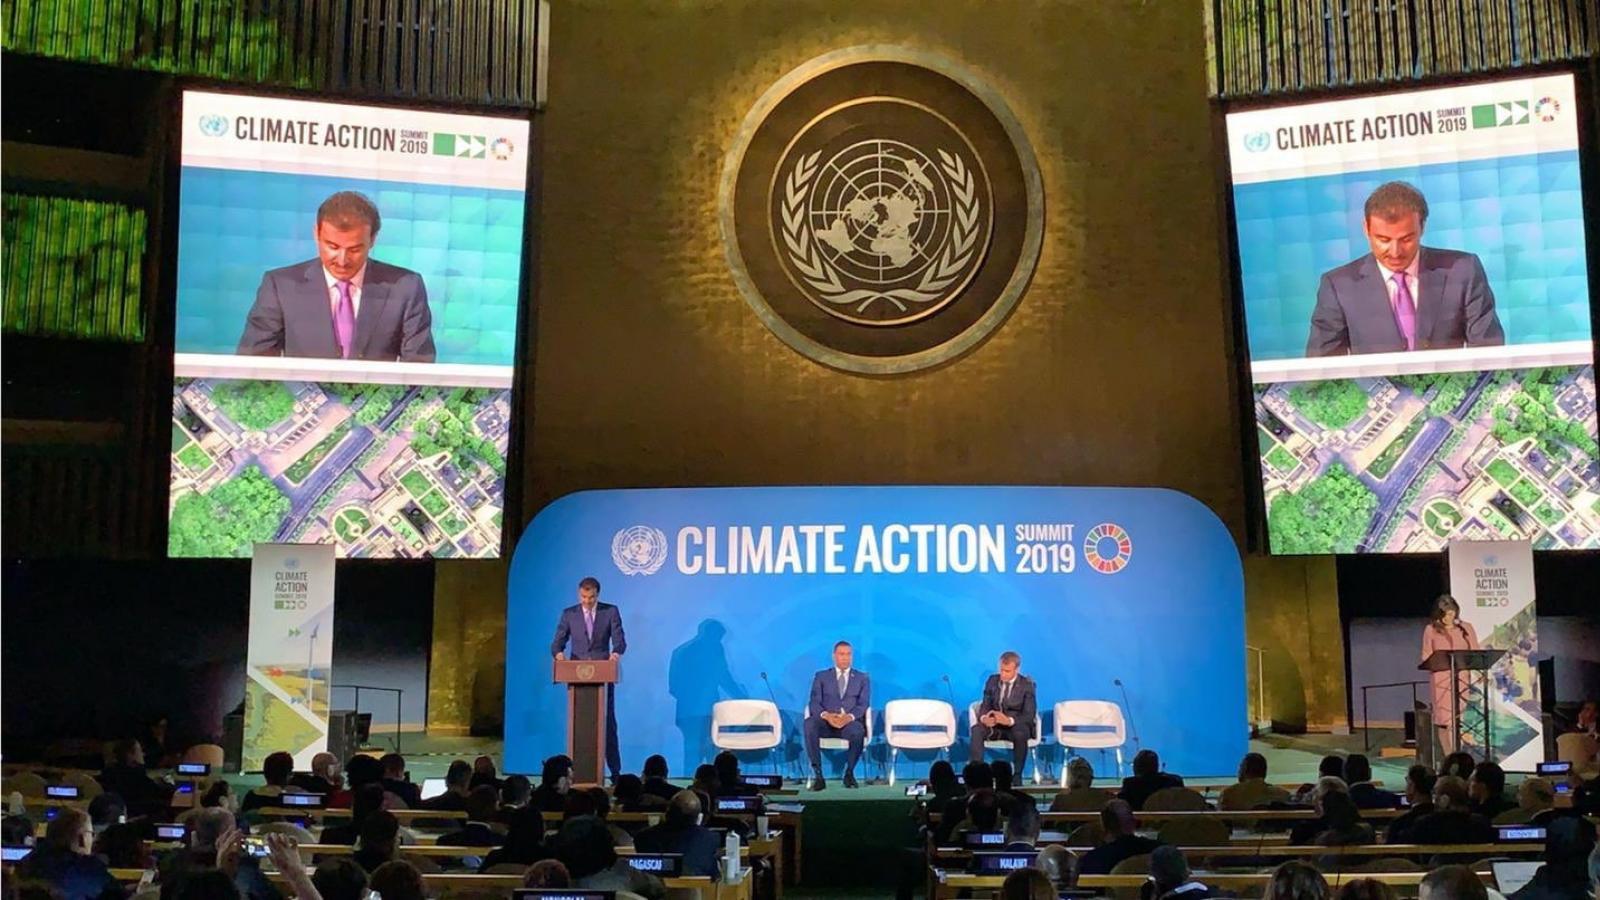 HH the Amir pledges $100 million to tackle climate change